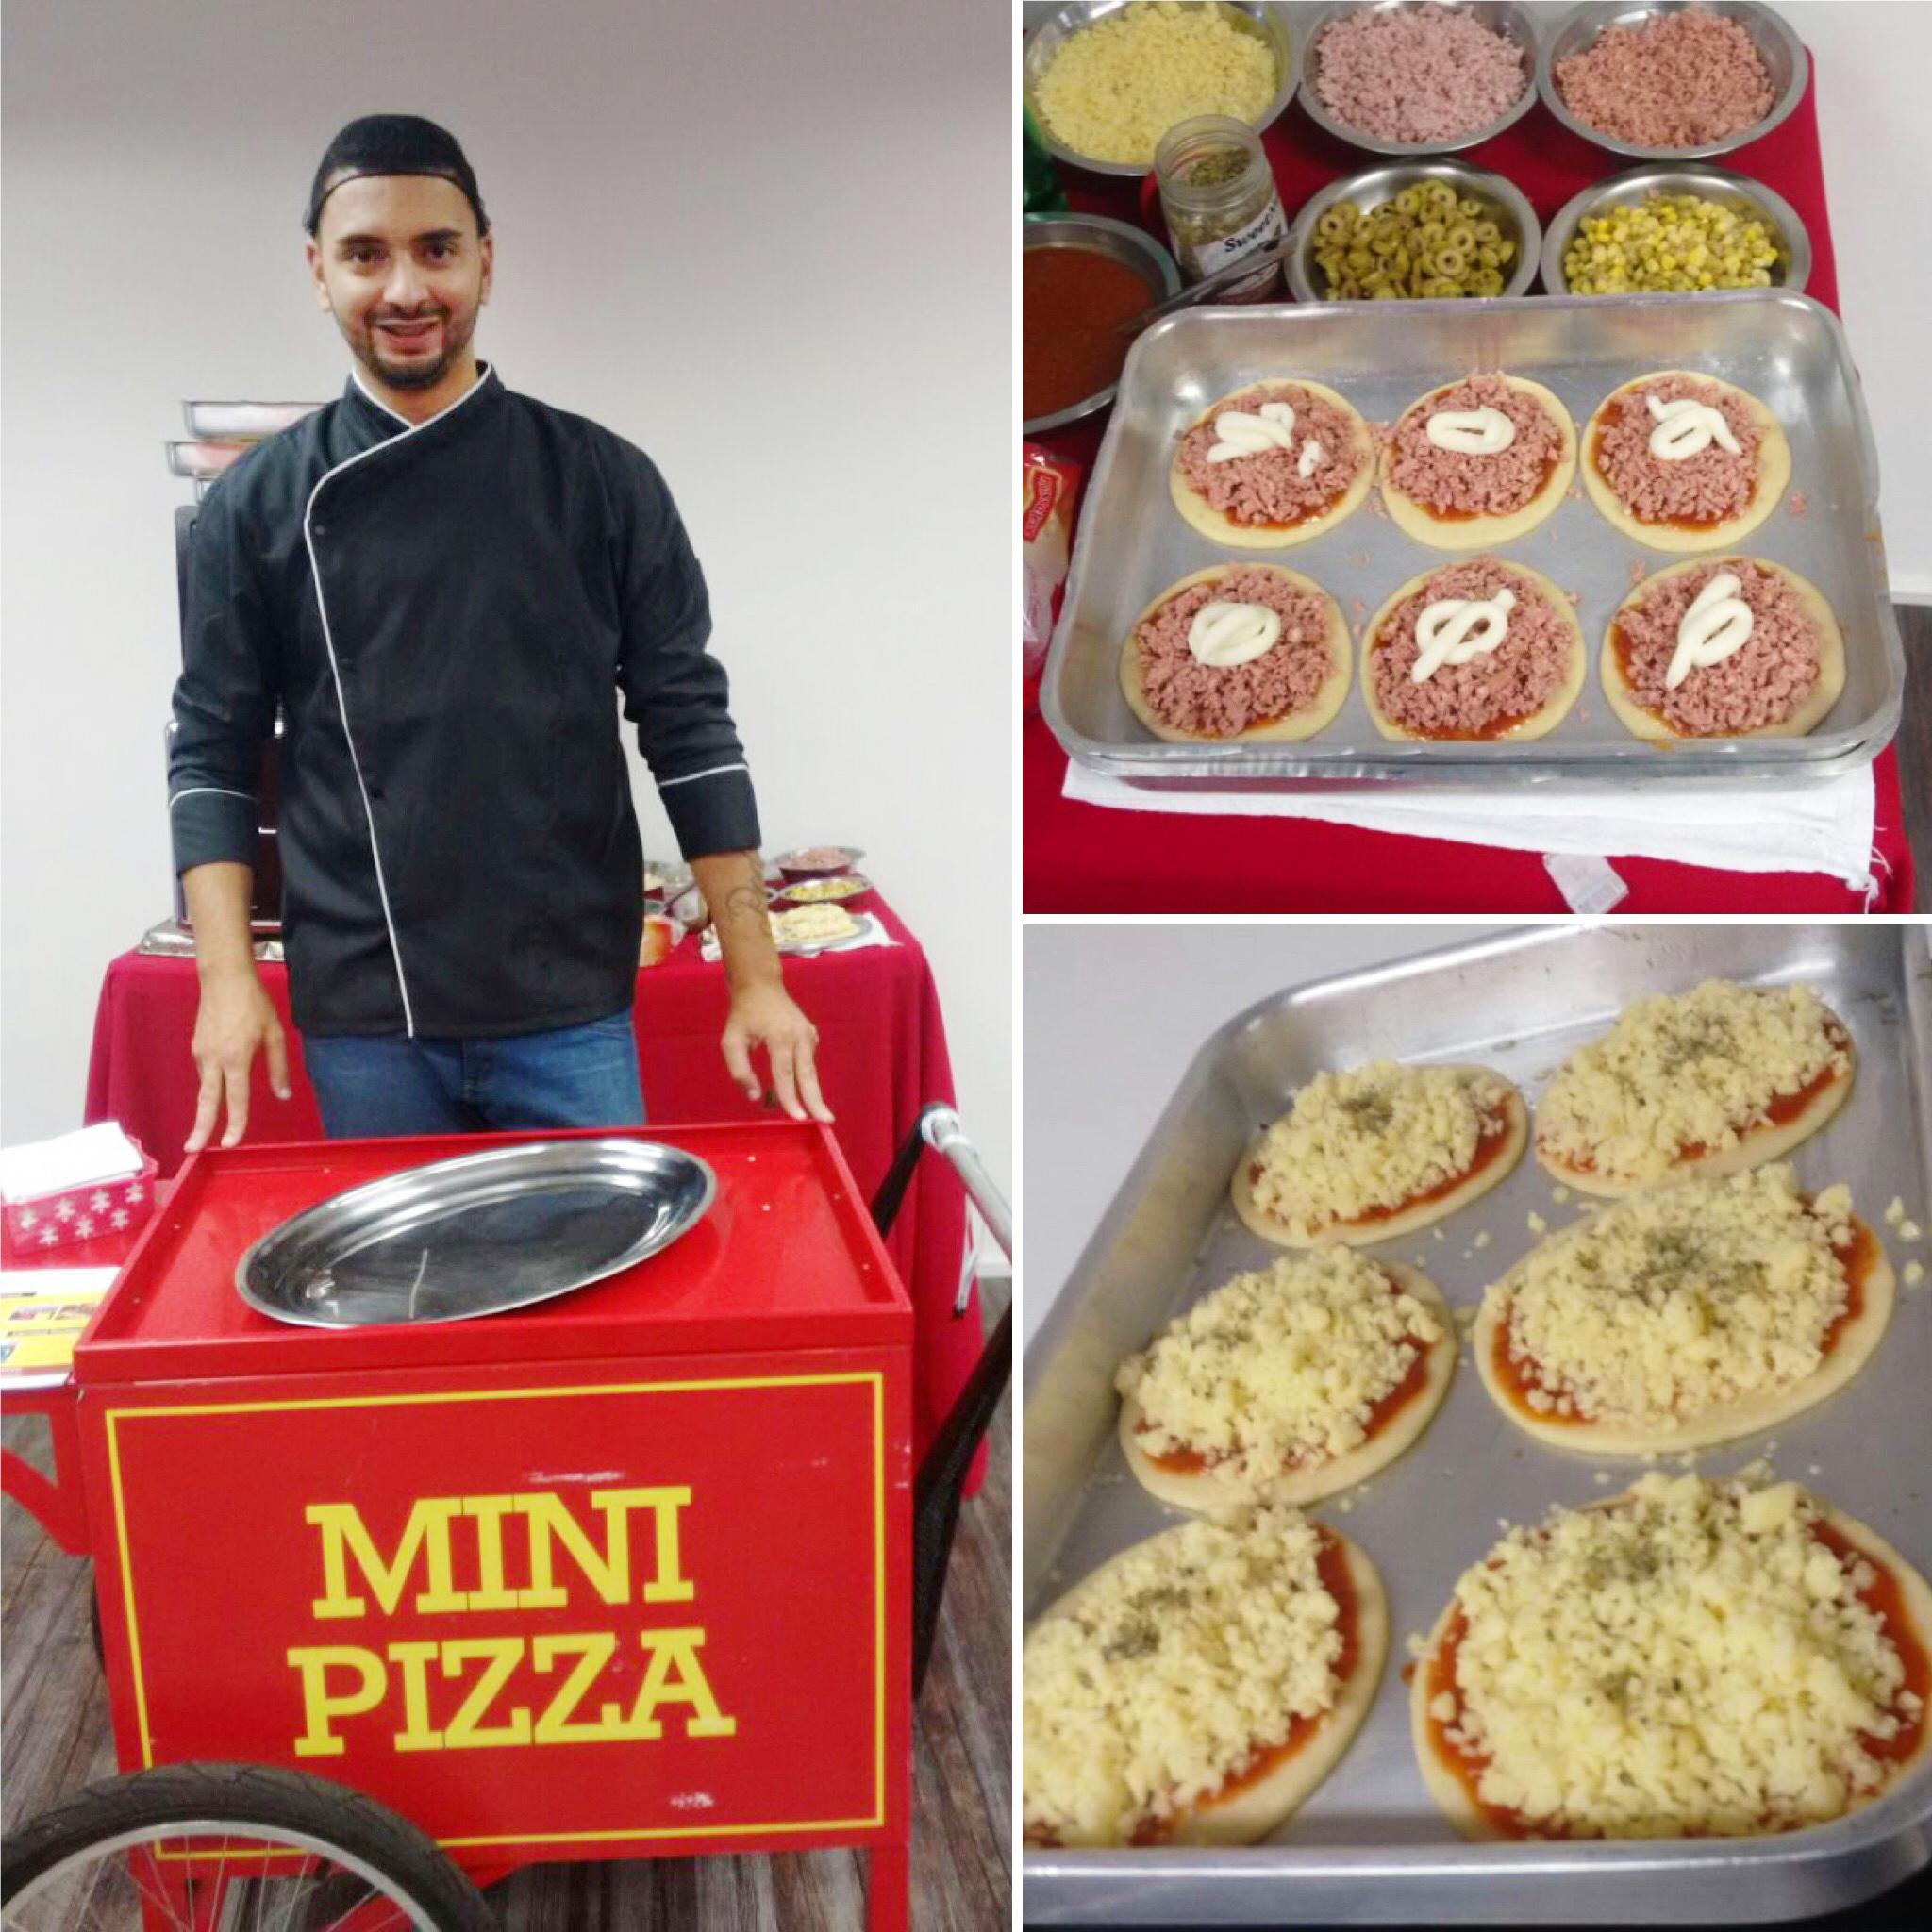 Carrinho - Mini Pizza